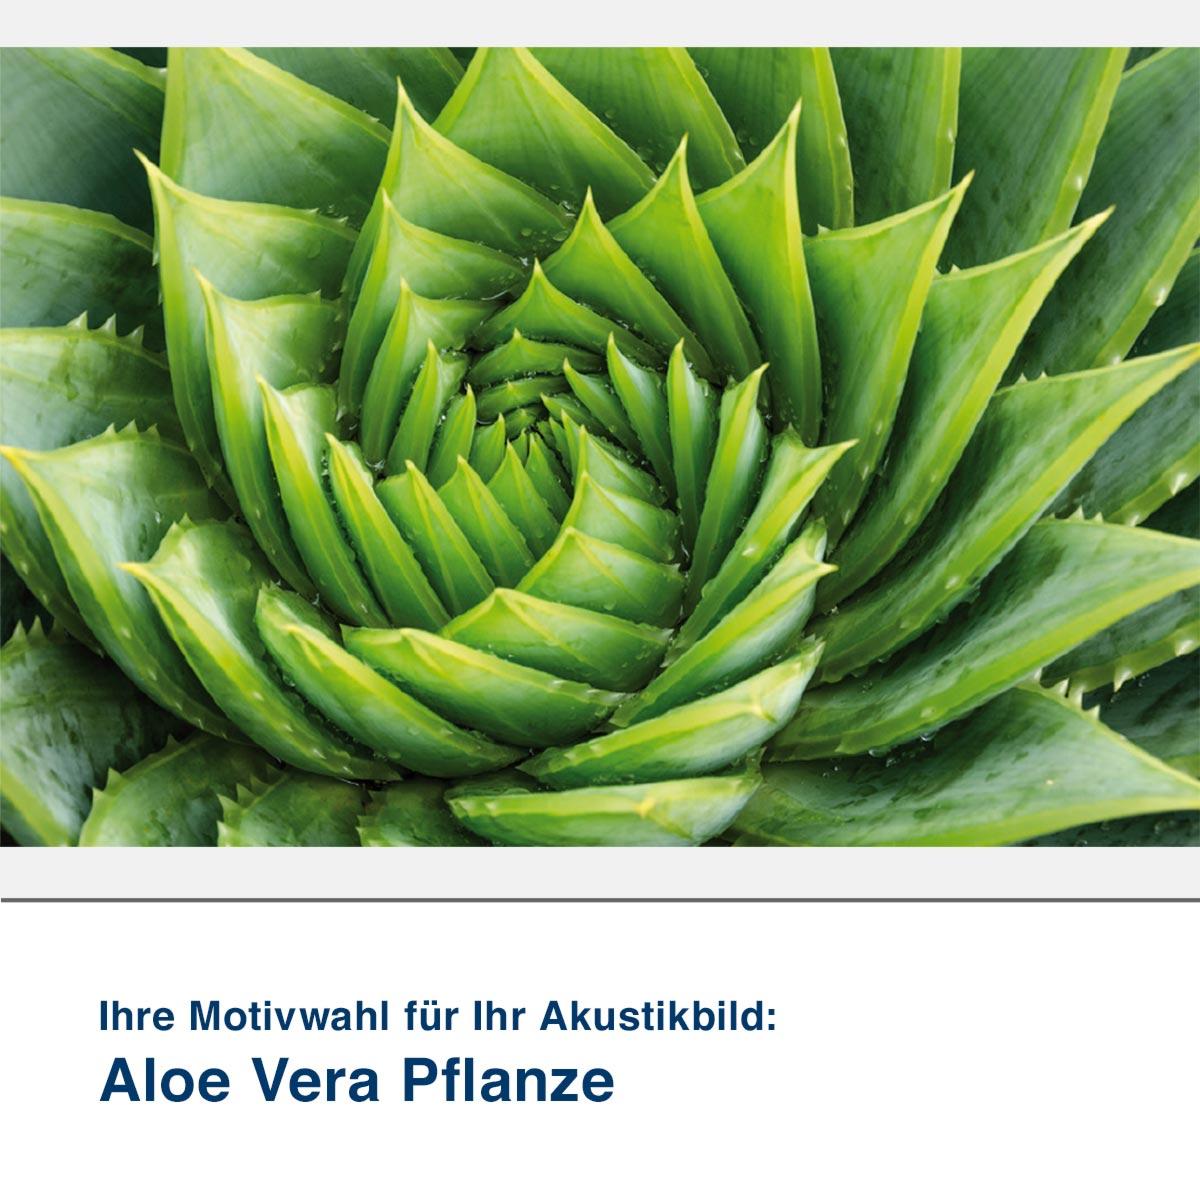 Akustikbild Motiv Aloe Vera Pflanze